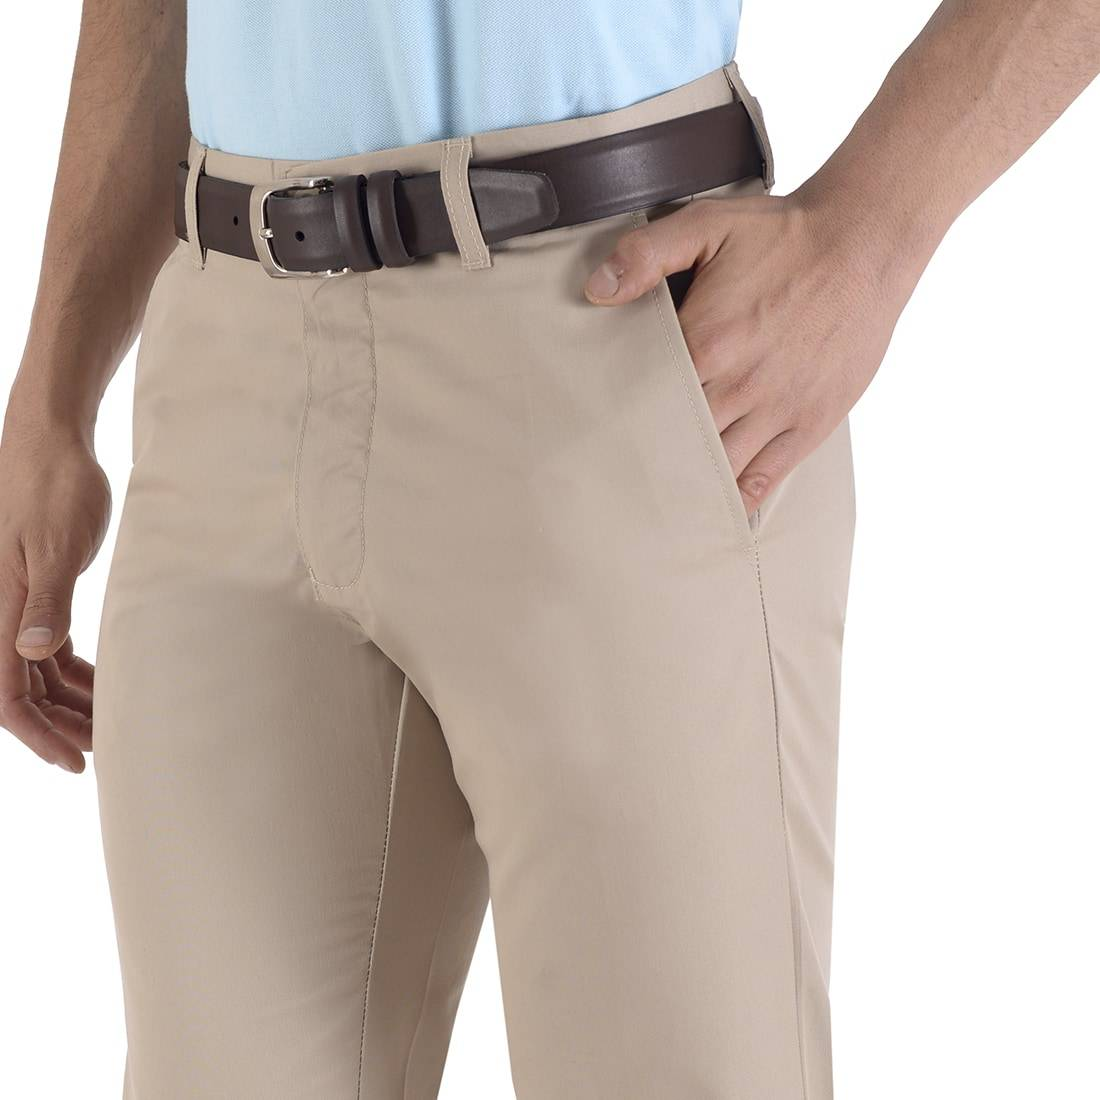 010920418961-03-Pantalon-Casual-Slim-Fit-Beige-yale